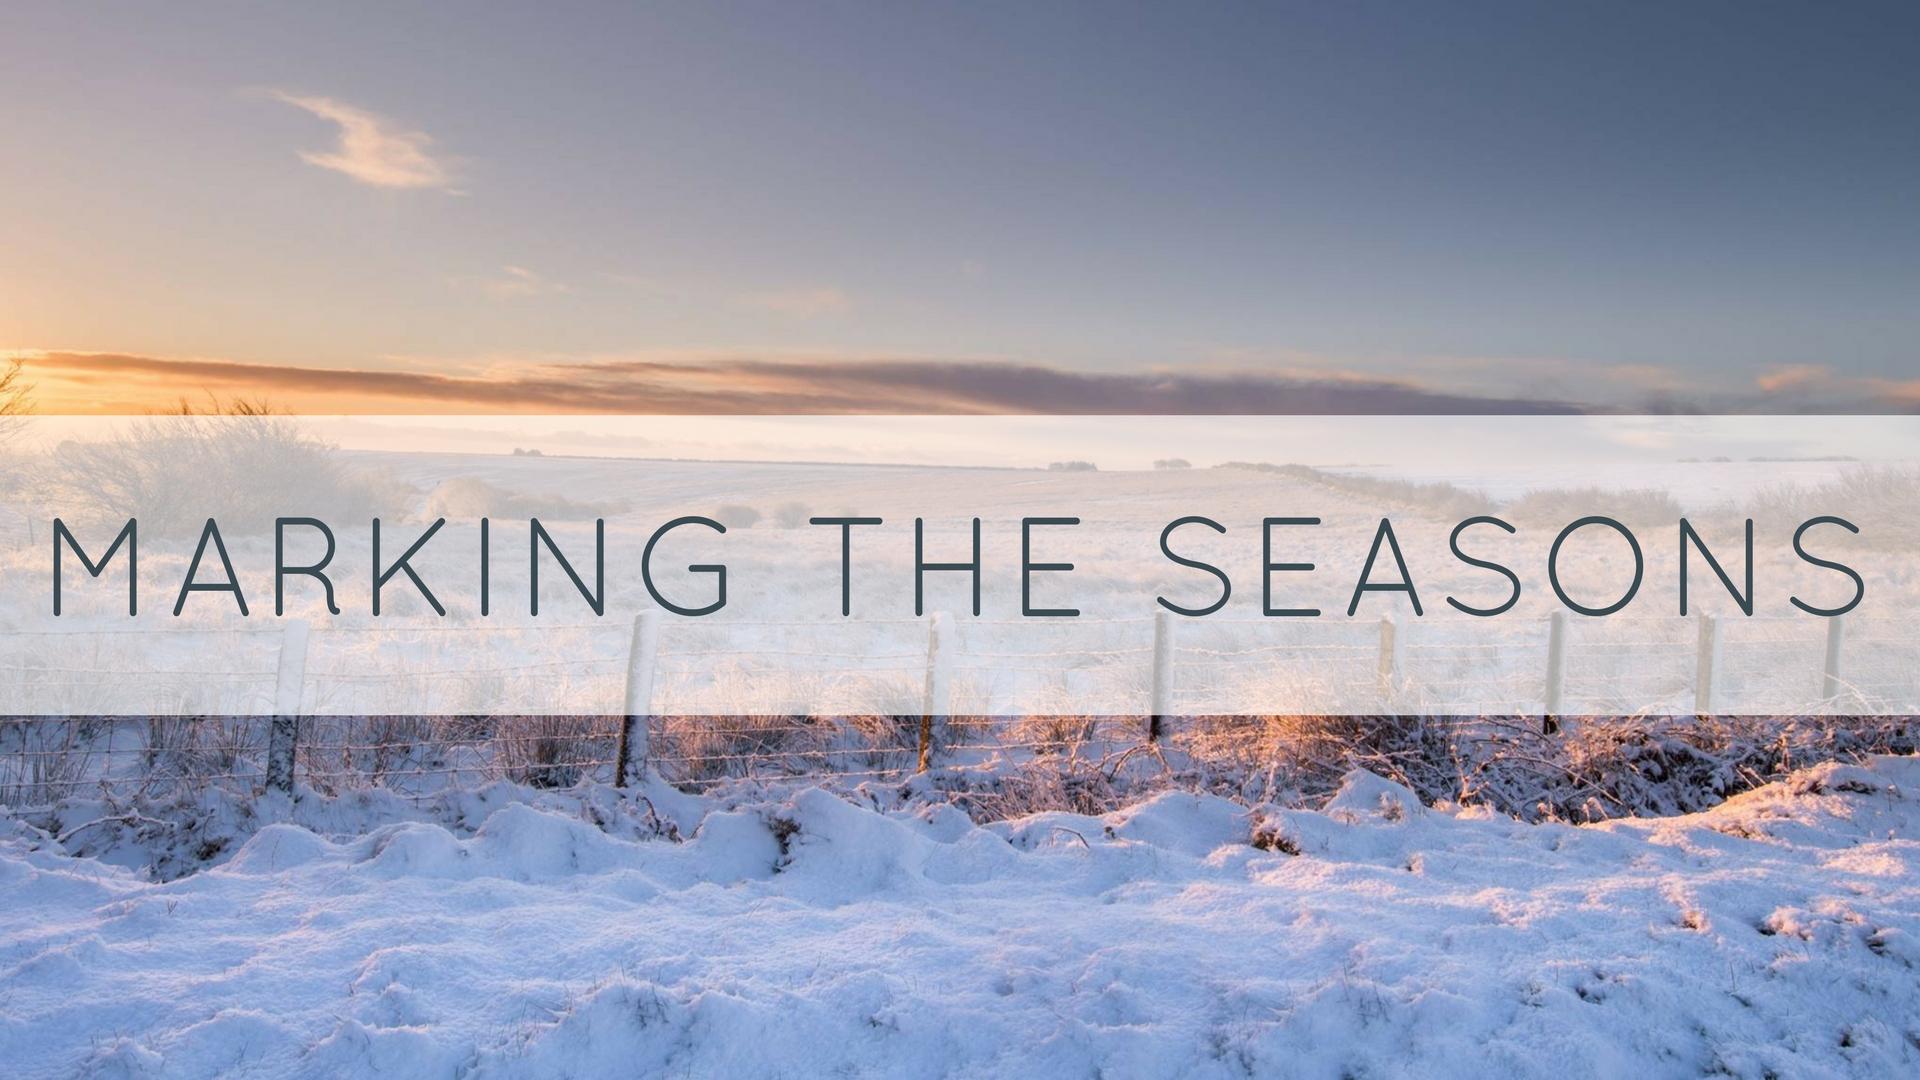 Marking the seasons.jpg